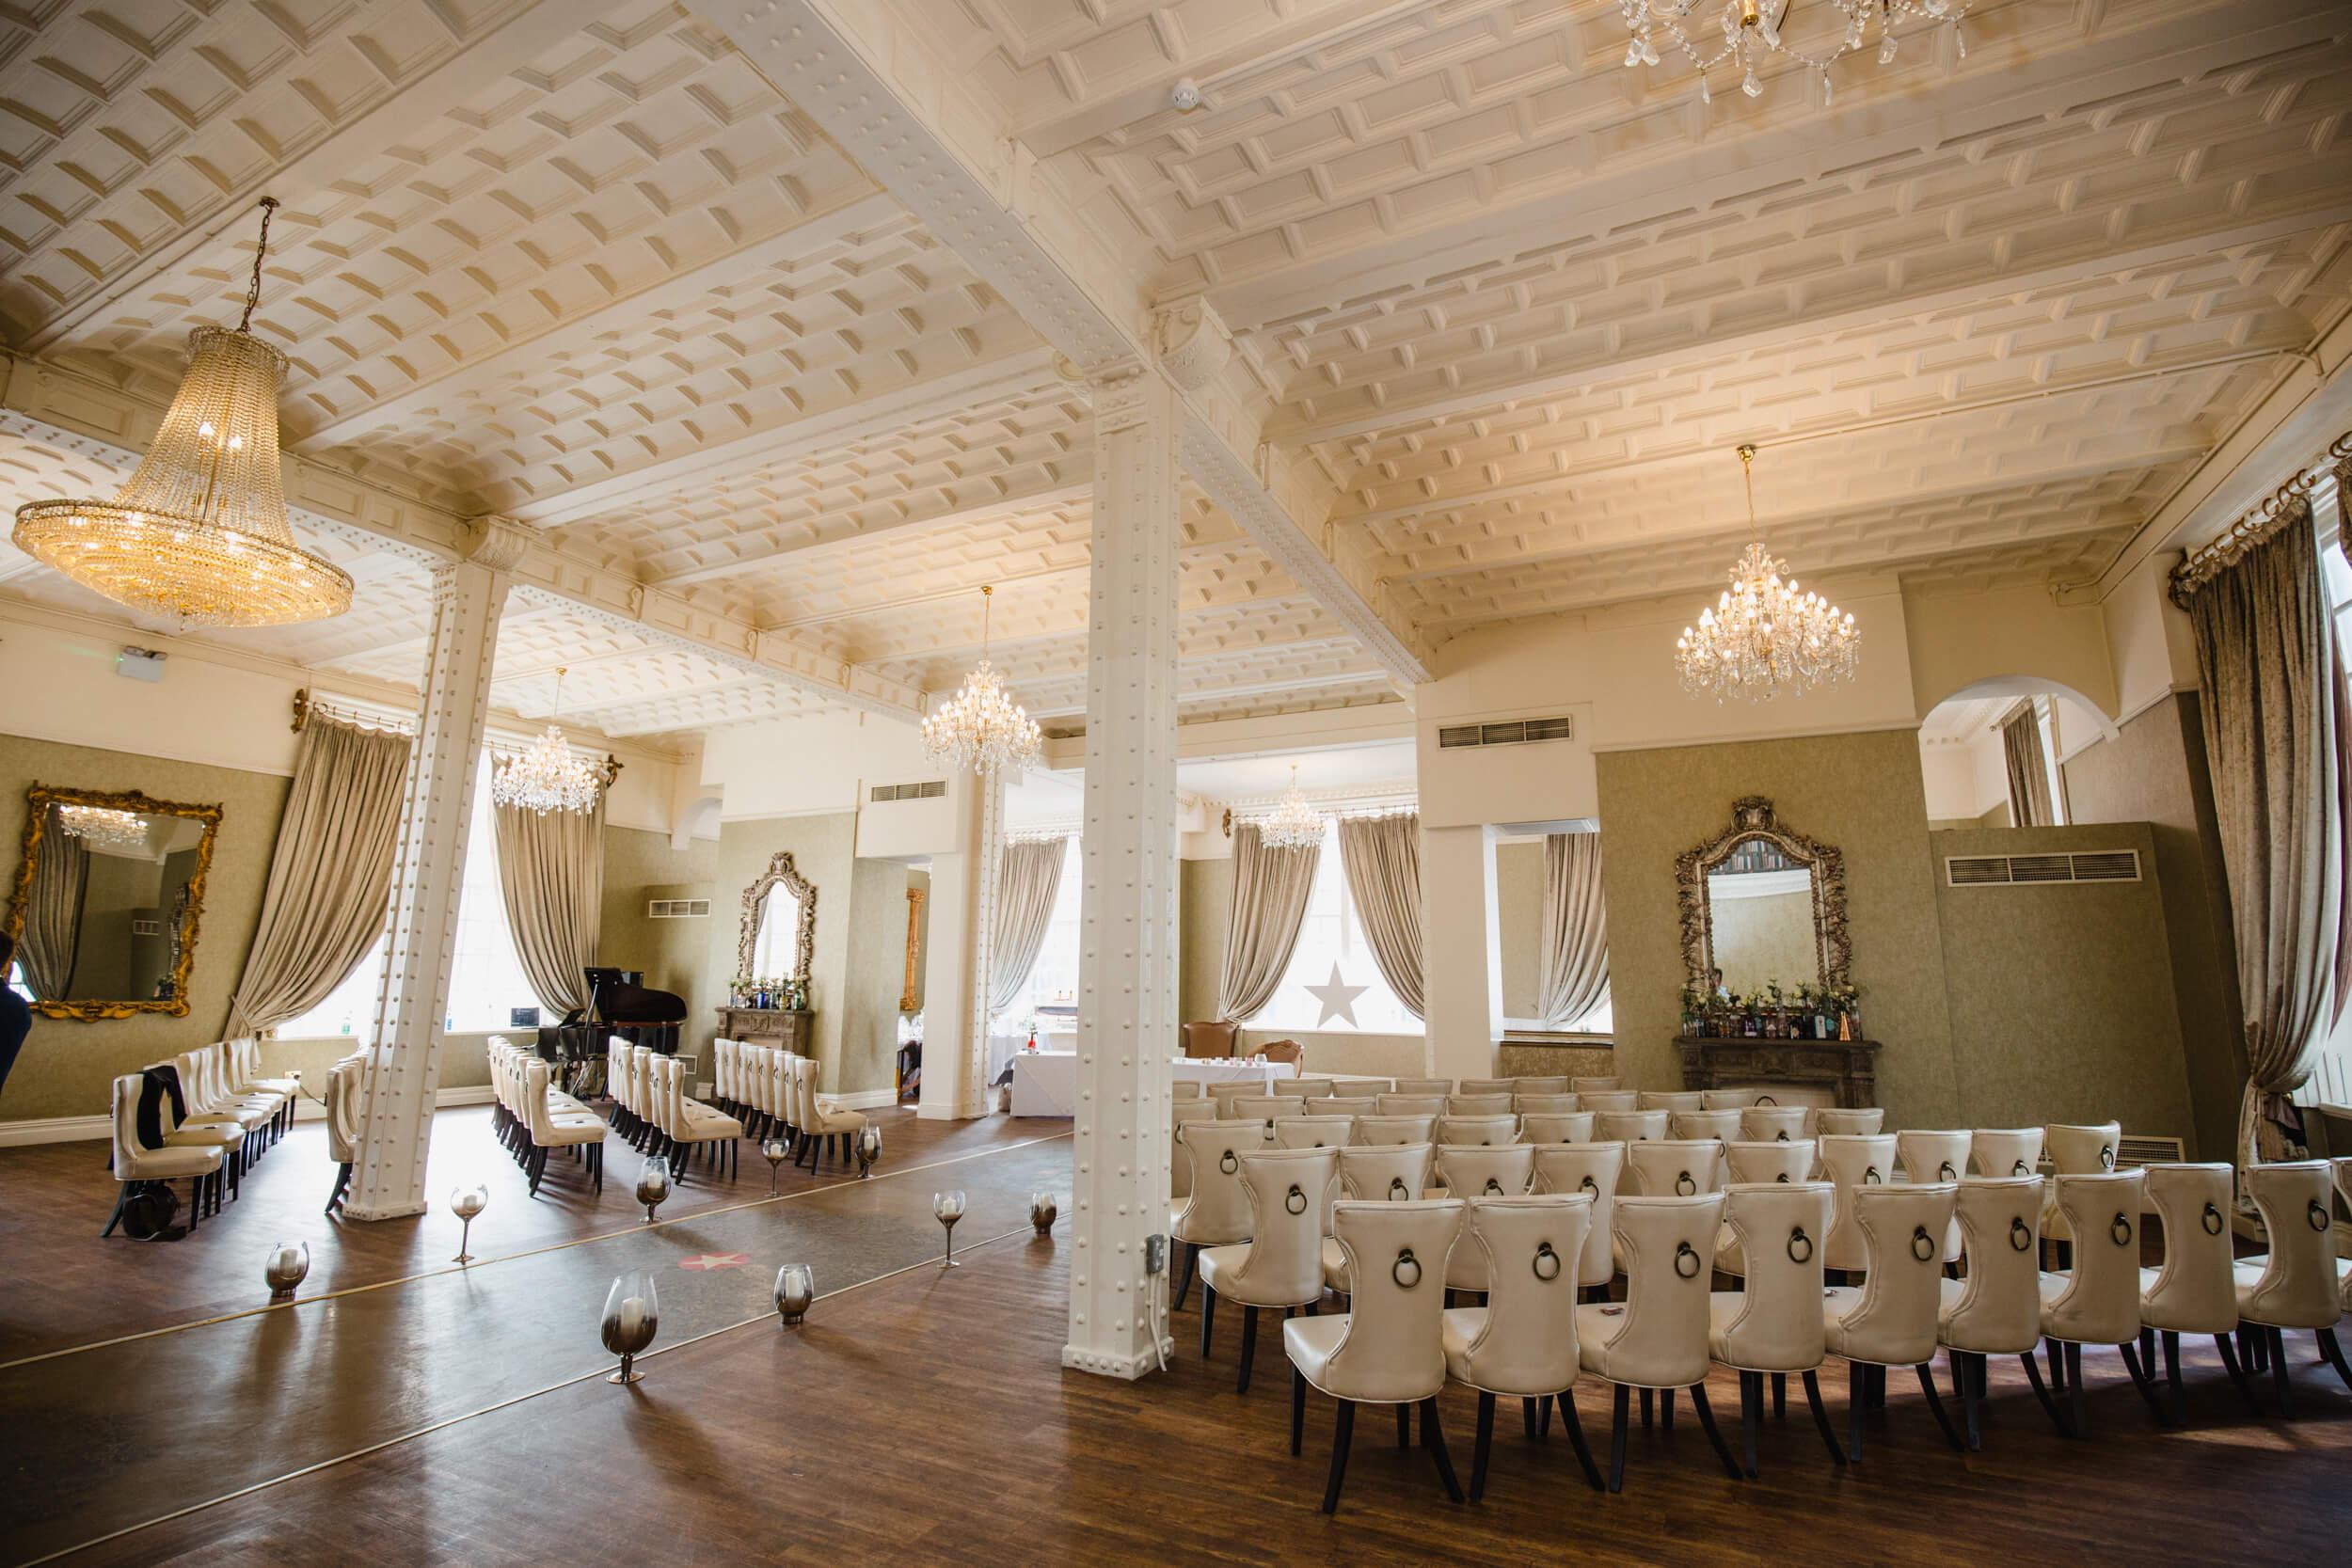 30_James_Street_Hotel_Wedding_Venue_015.jpg